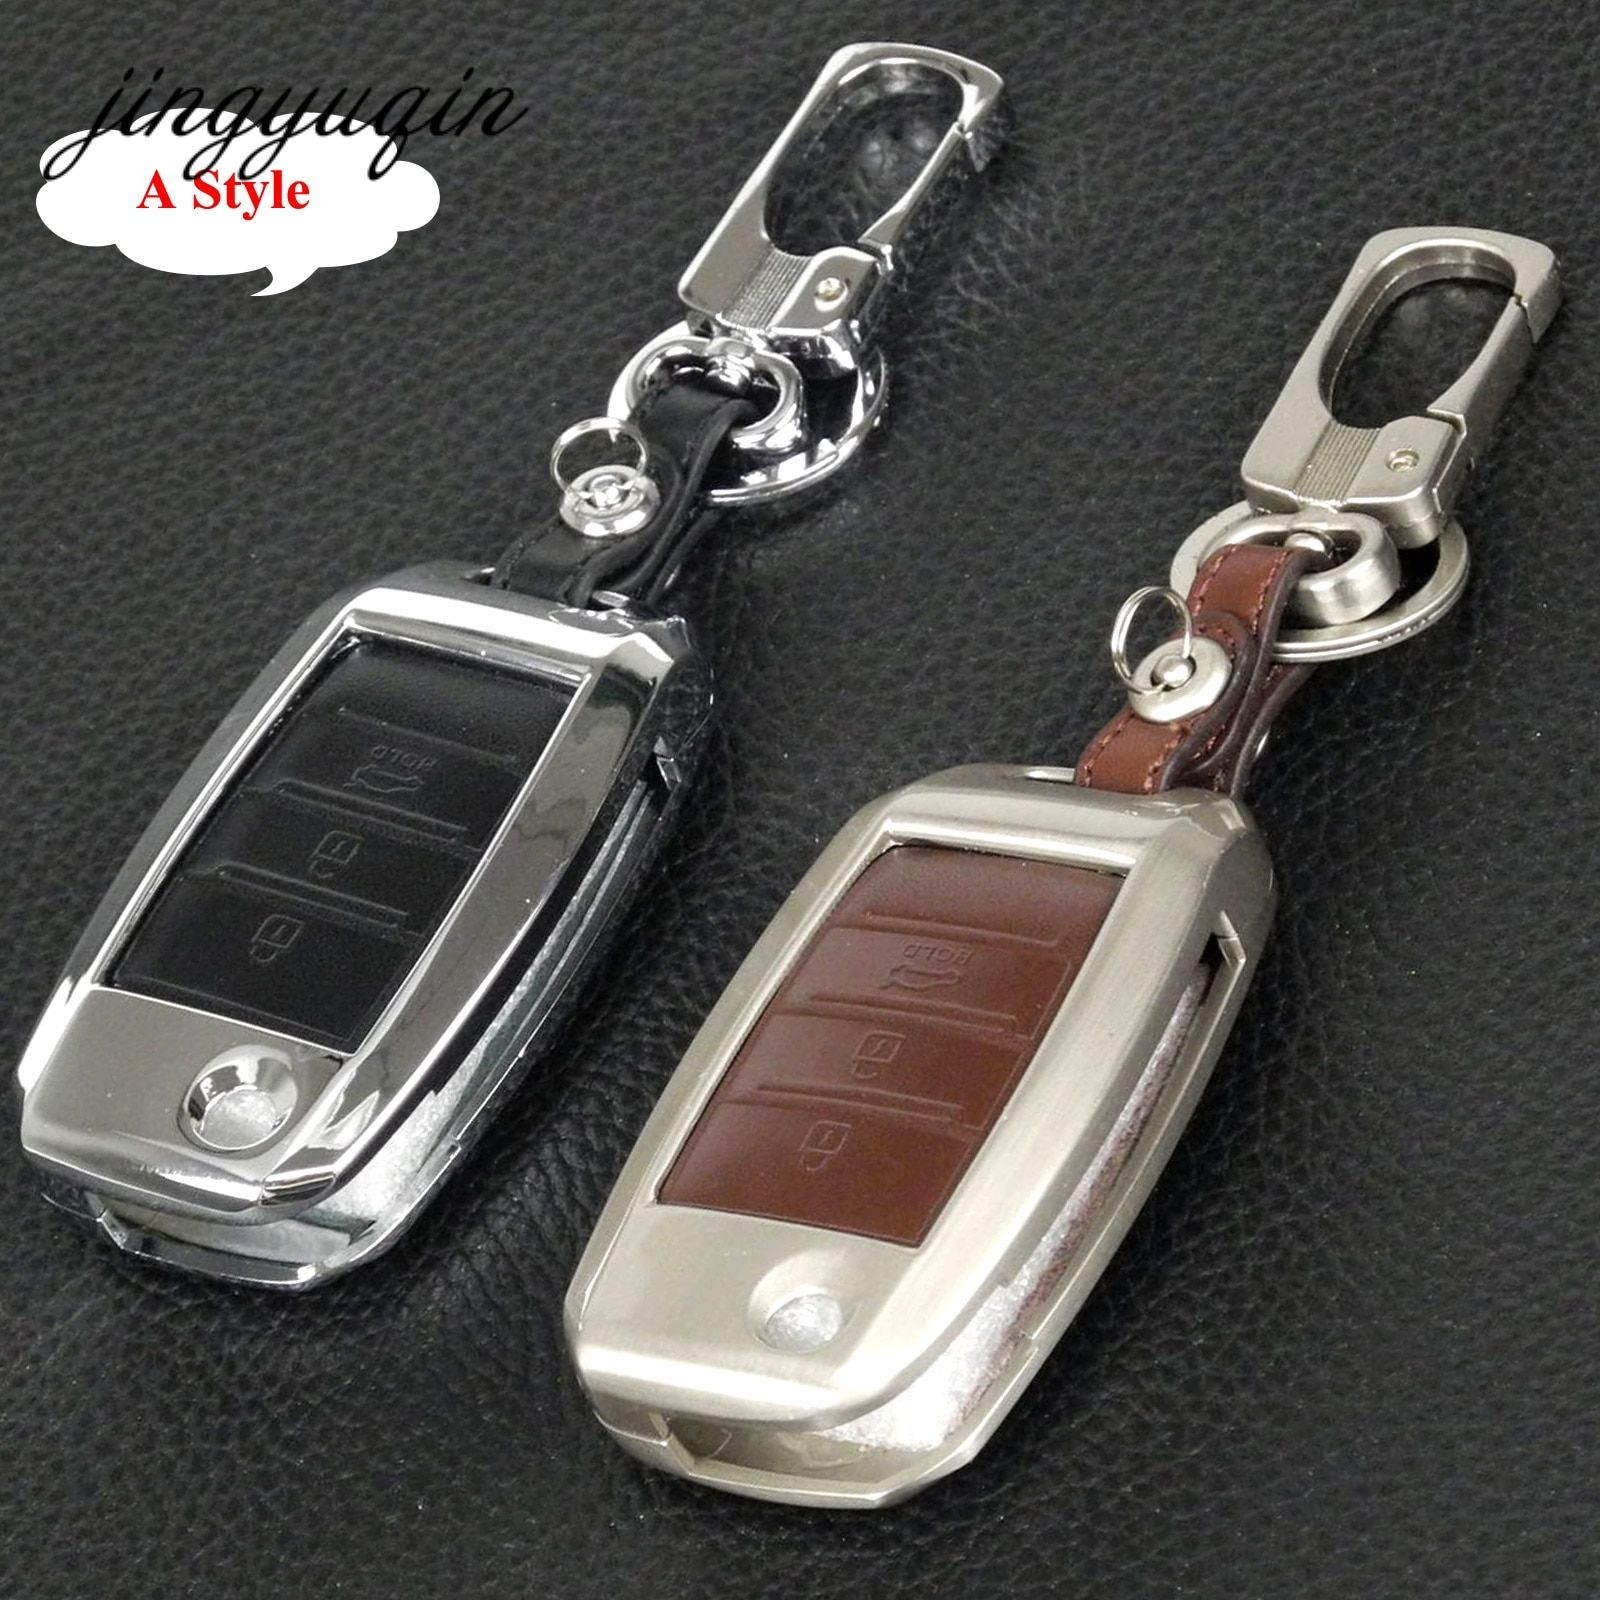 jingyuqin Car Key Fob Cover For Kia Sportage R K2 K3 K4 K5 Ceed Sorento Cerato Optima Frote Zinc Alloy Leather Key Case Chain